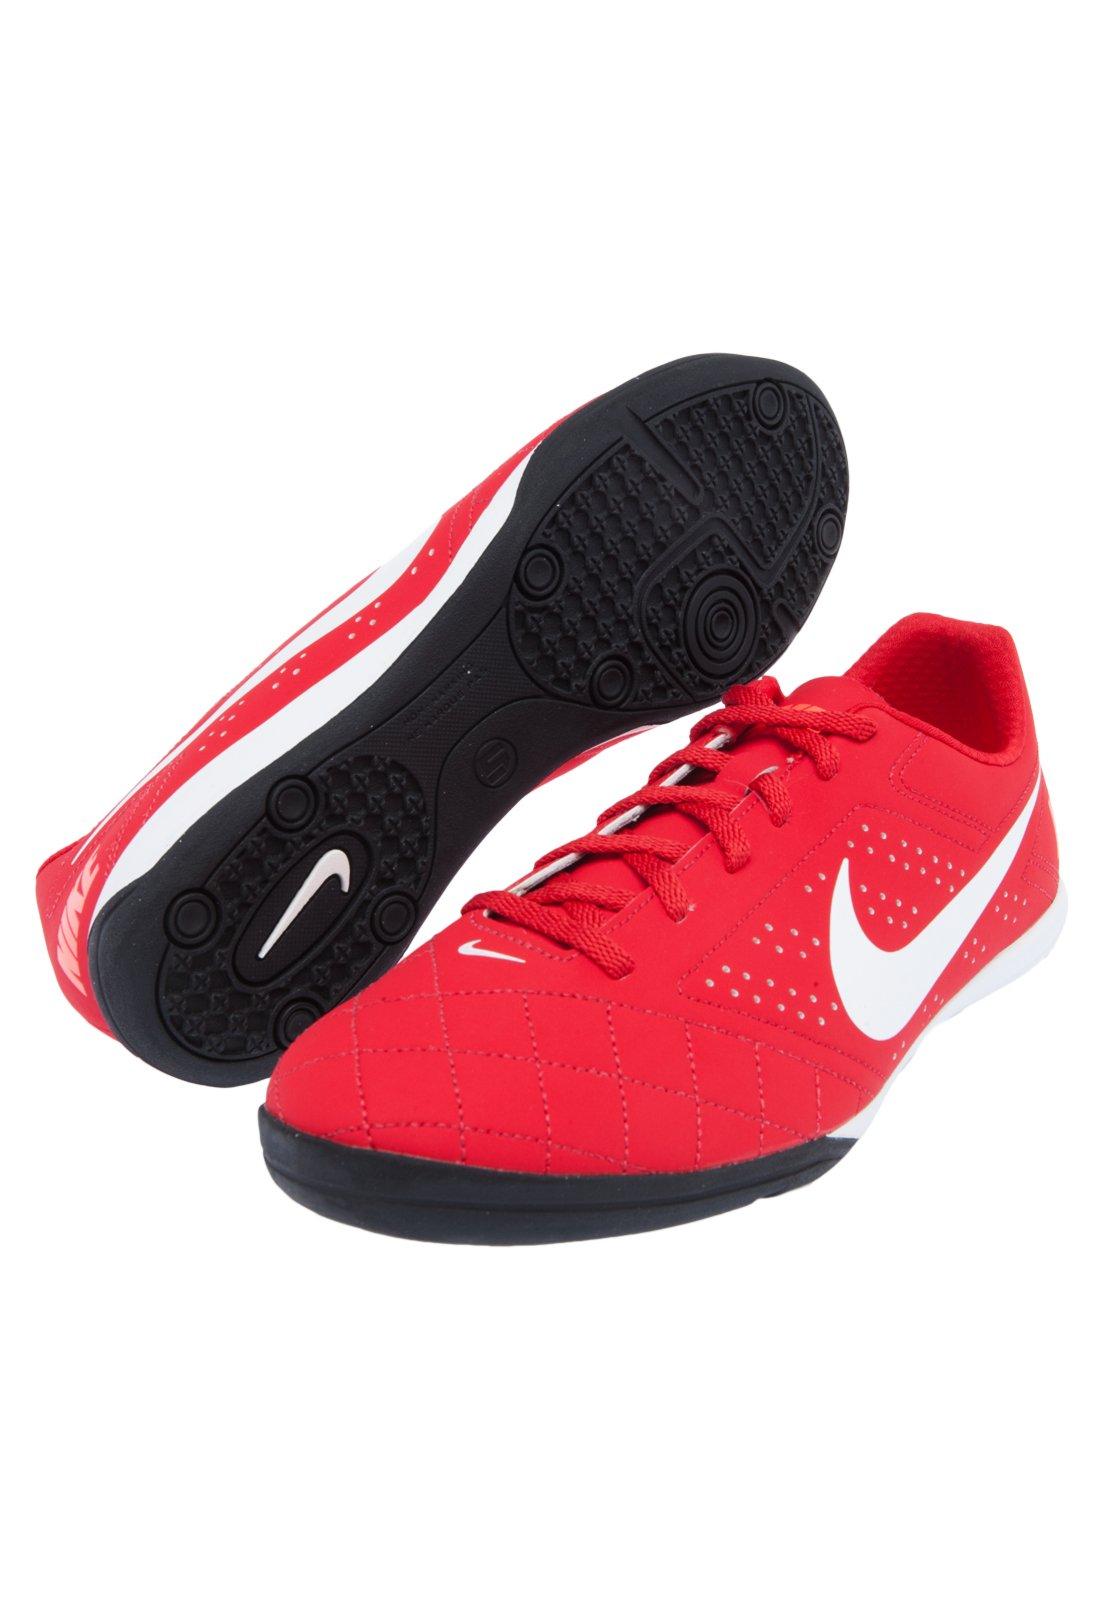 Chuteira Futsal Nike Beco 2 Futsal Branco e Azul